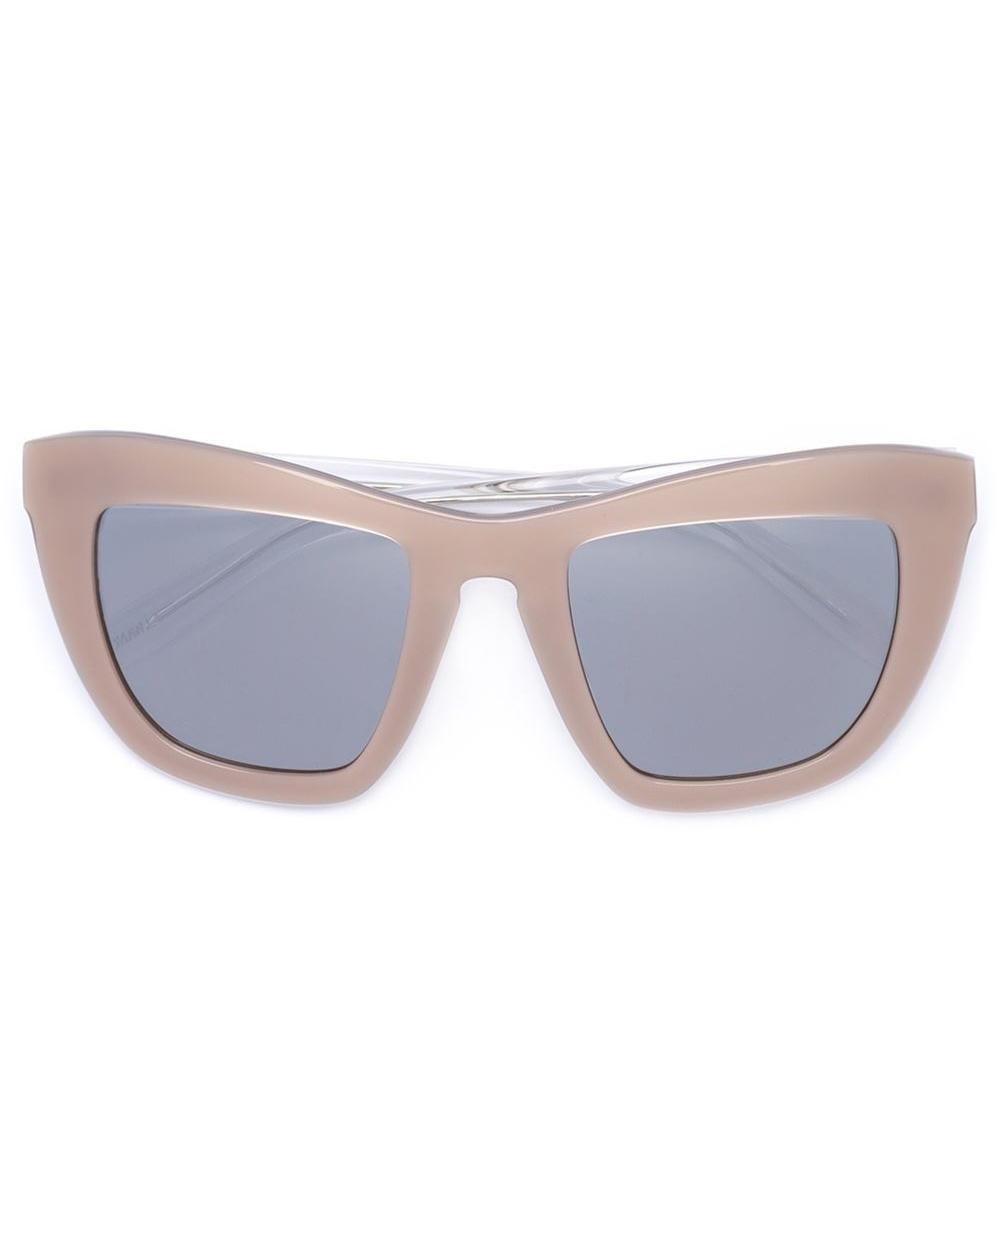 outdoor-wedding-outfit-vera-wang-sunglasses-0616.jpg